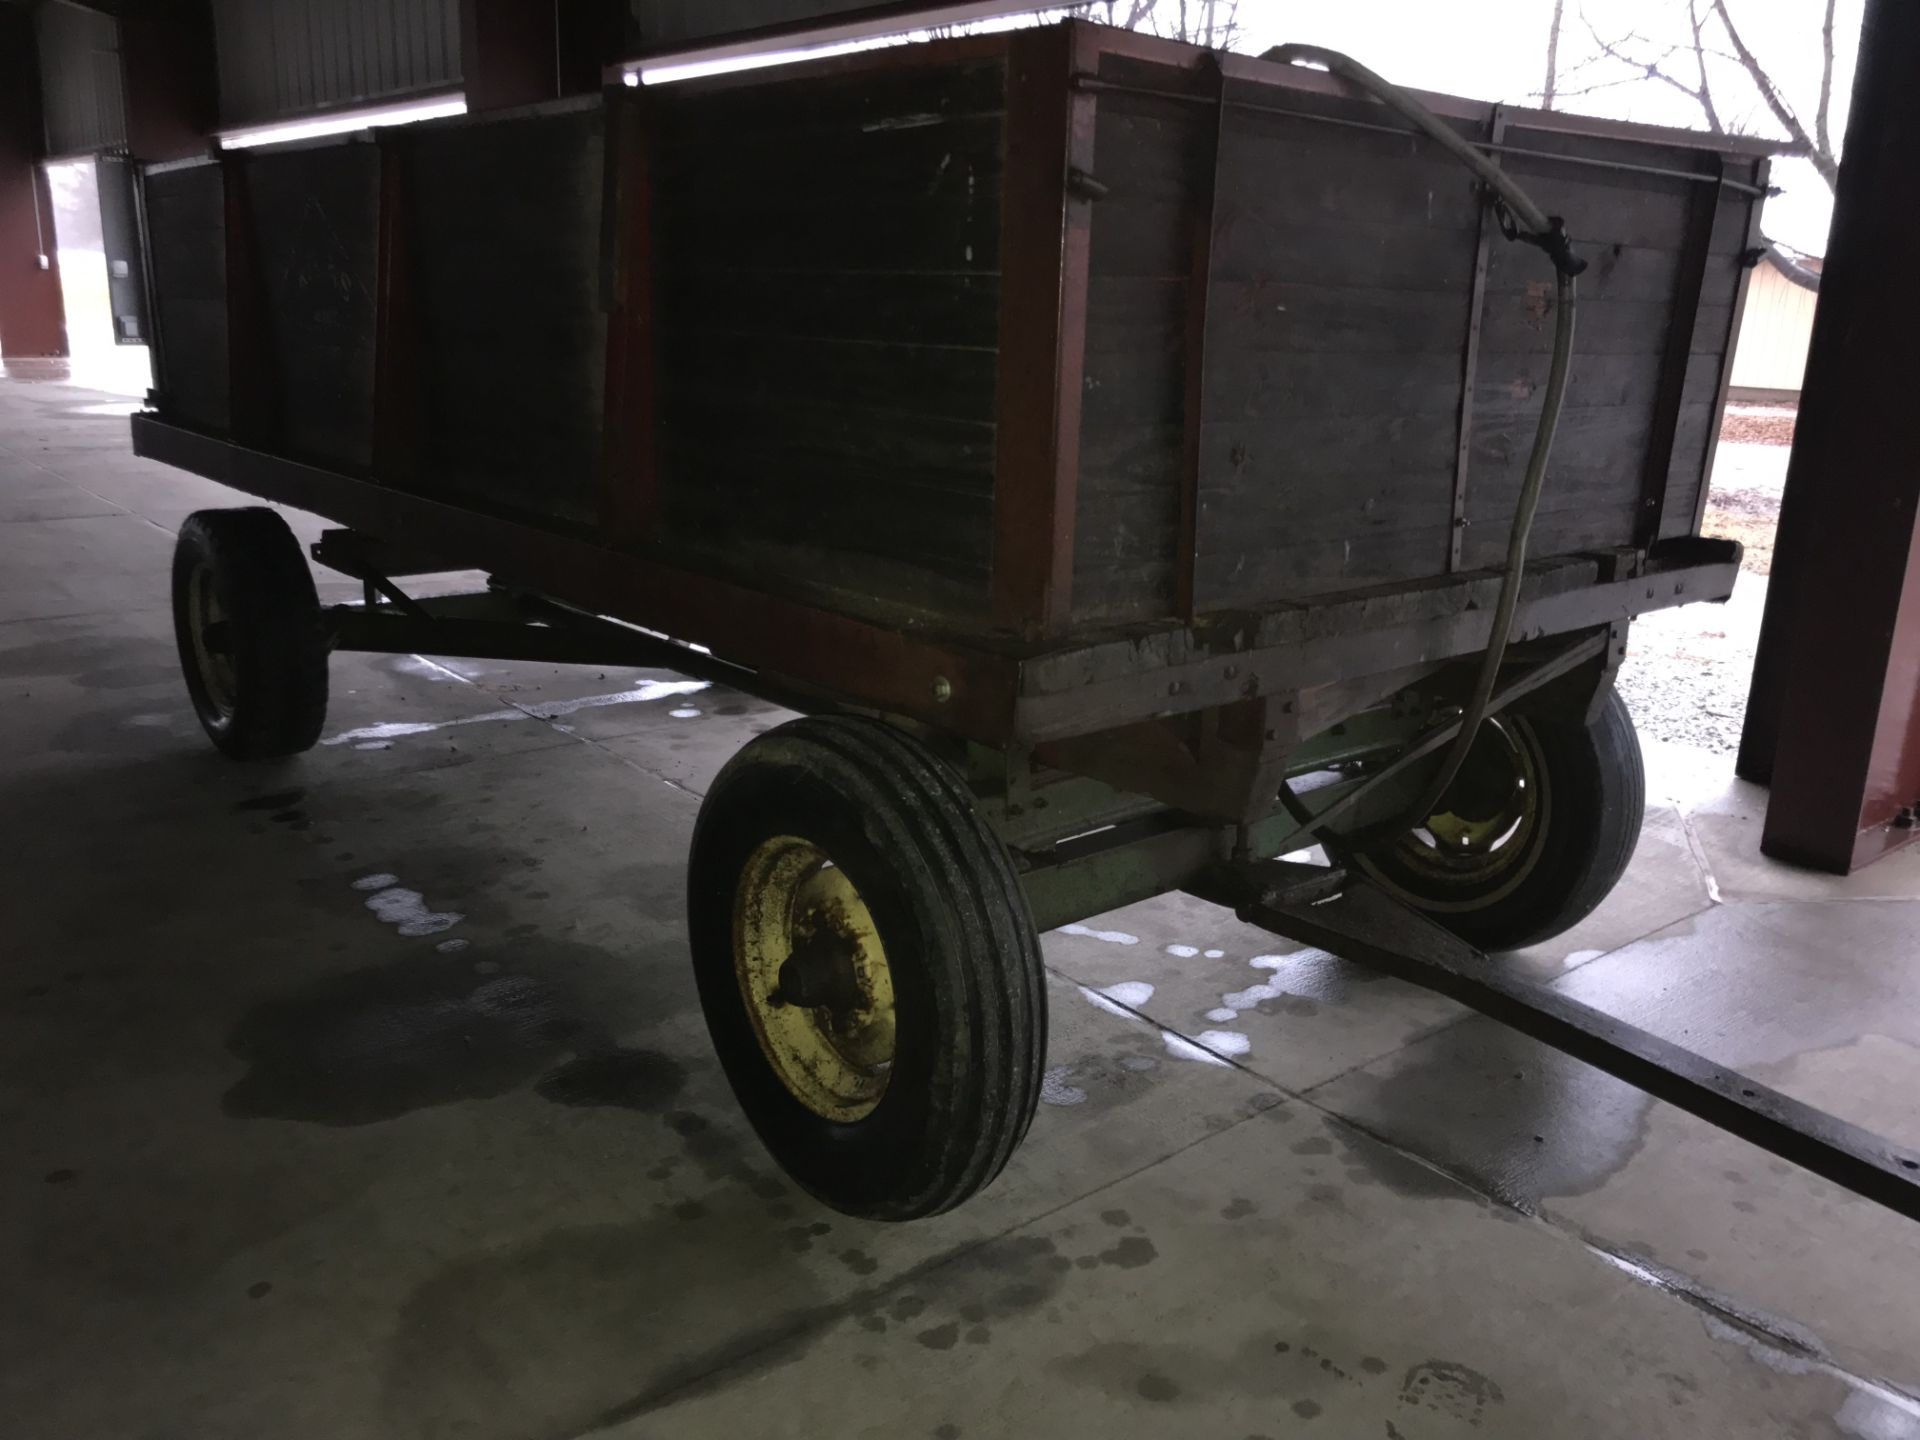 Lot 59 - Wood Barge Wagon w/Hoist on JD Gear